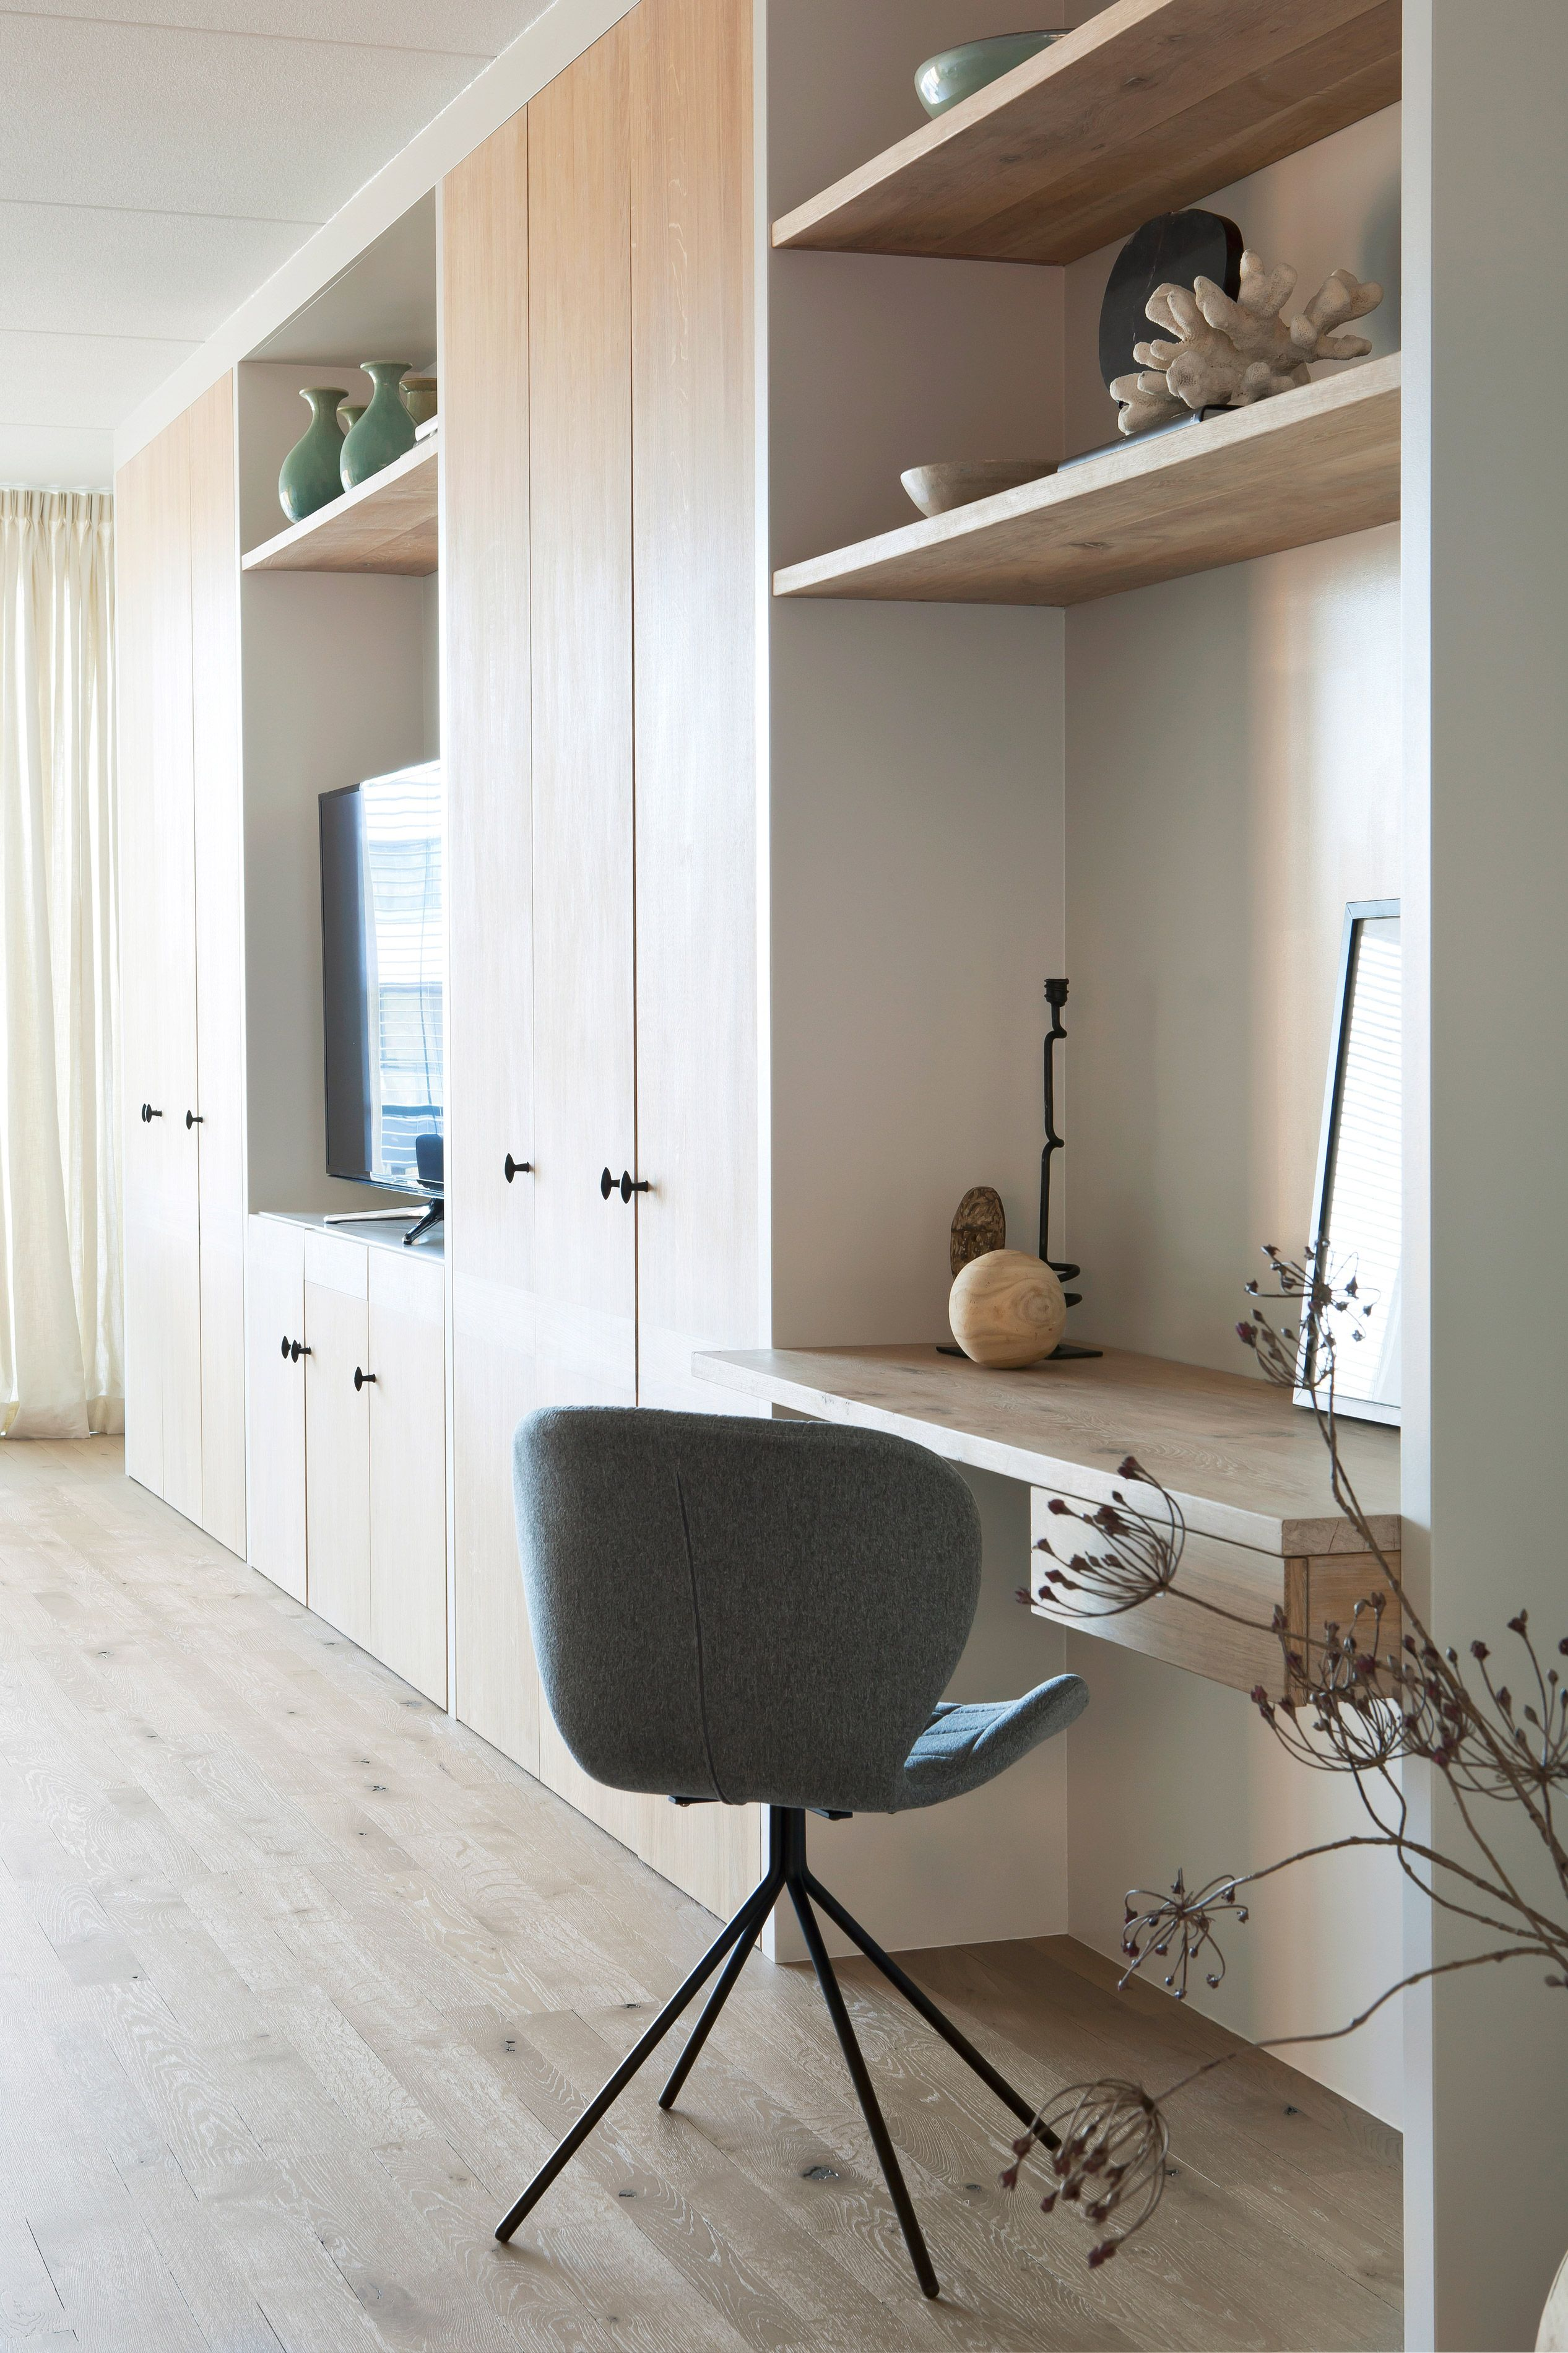 Woonkamer inspiratie | Werkplek in woonkamer | Kastenwand | Foto ...